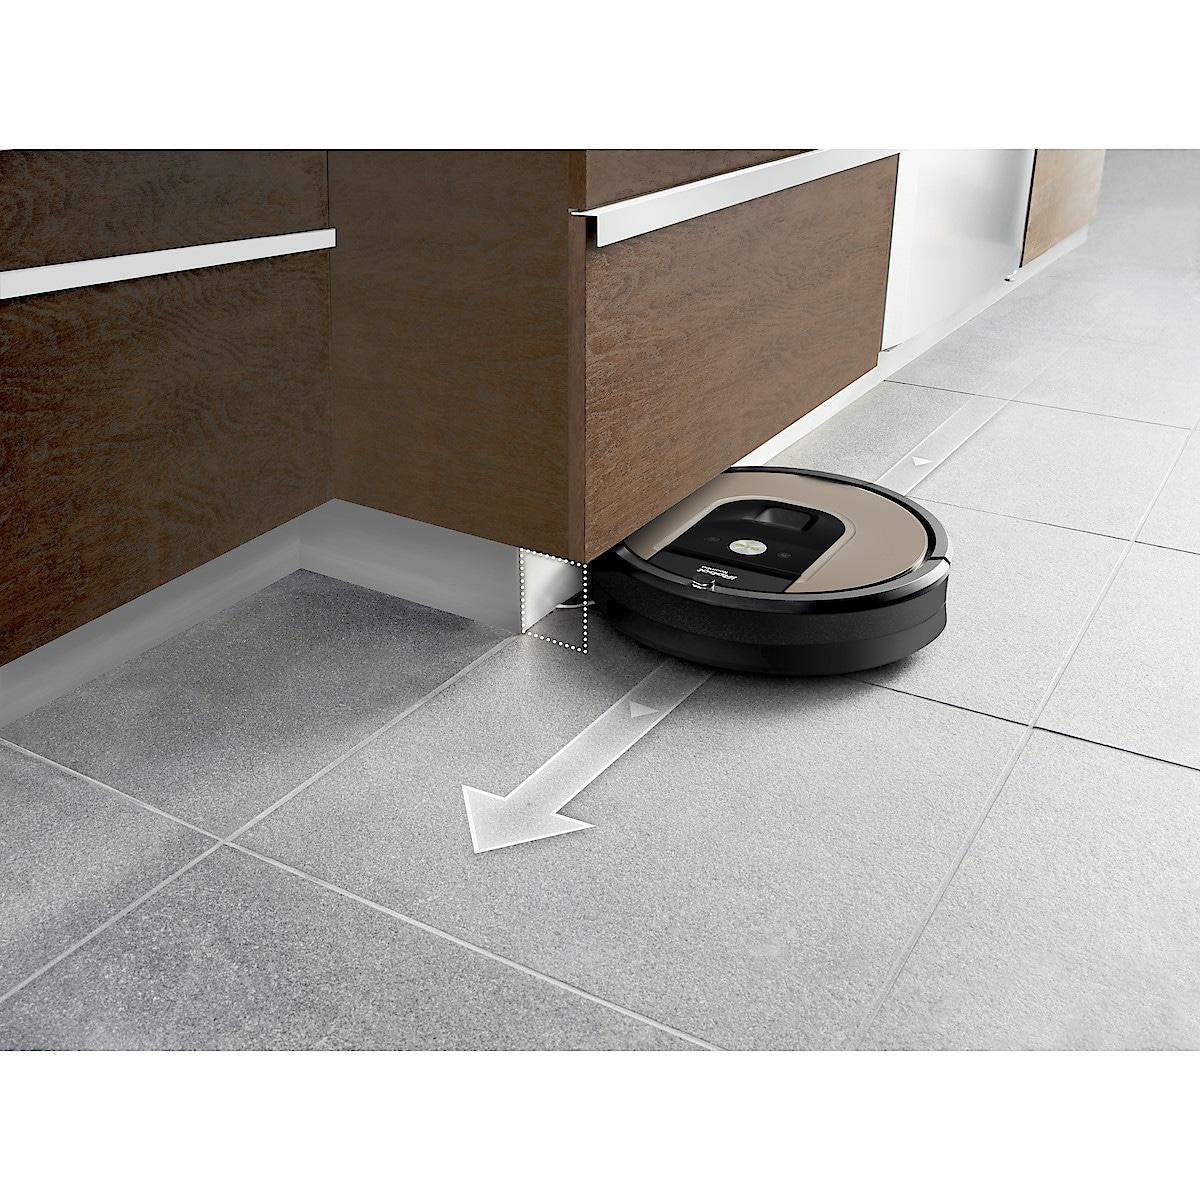 iRobot Roomba 966, robotstøvsuger